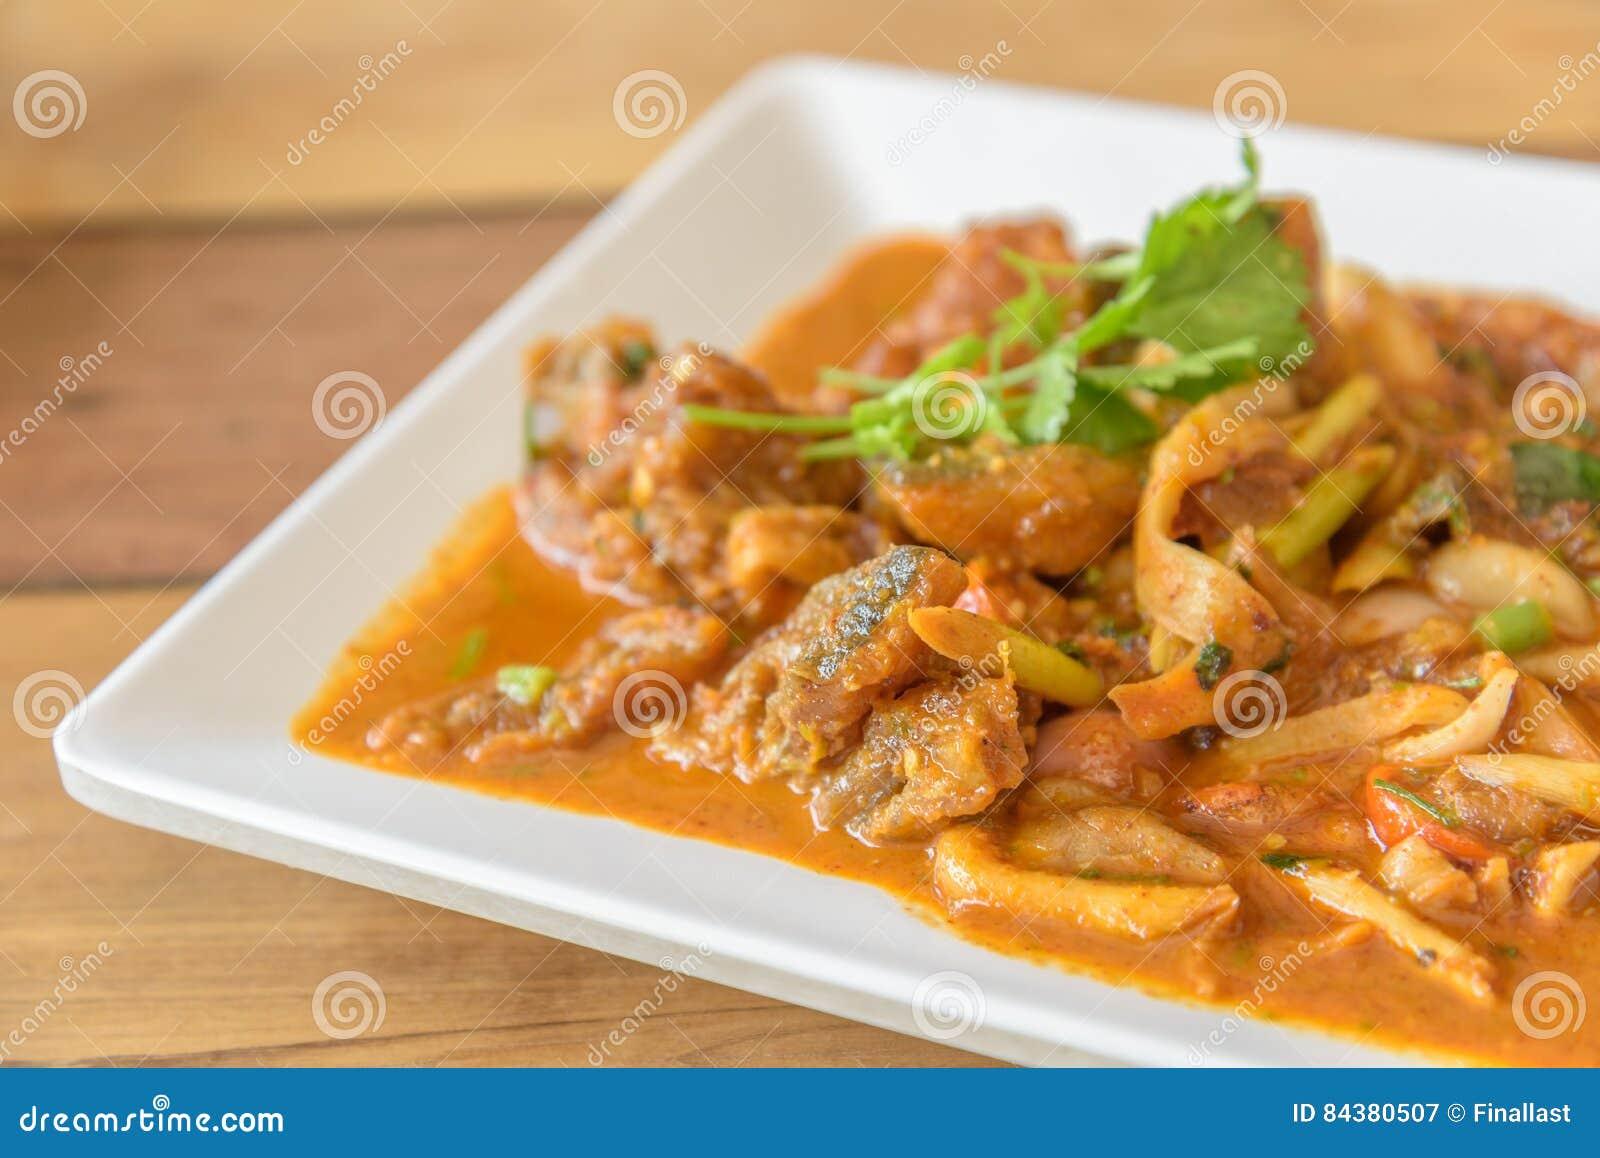 Rainbow trout stir fried with tom yam dressing